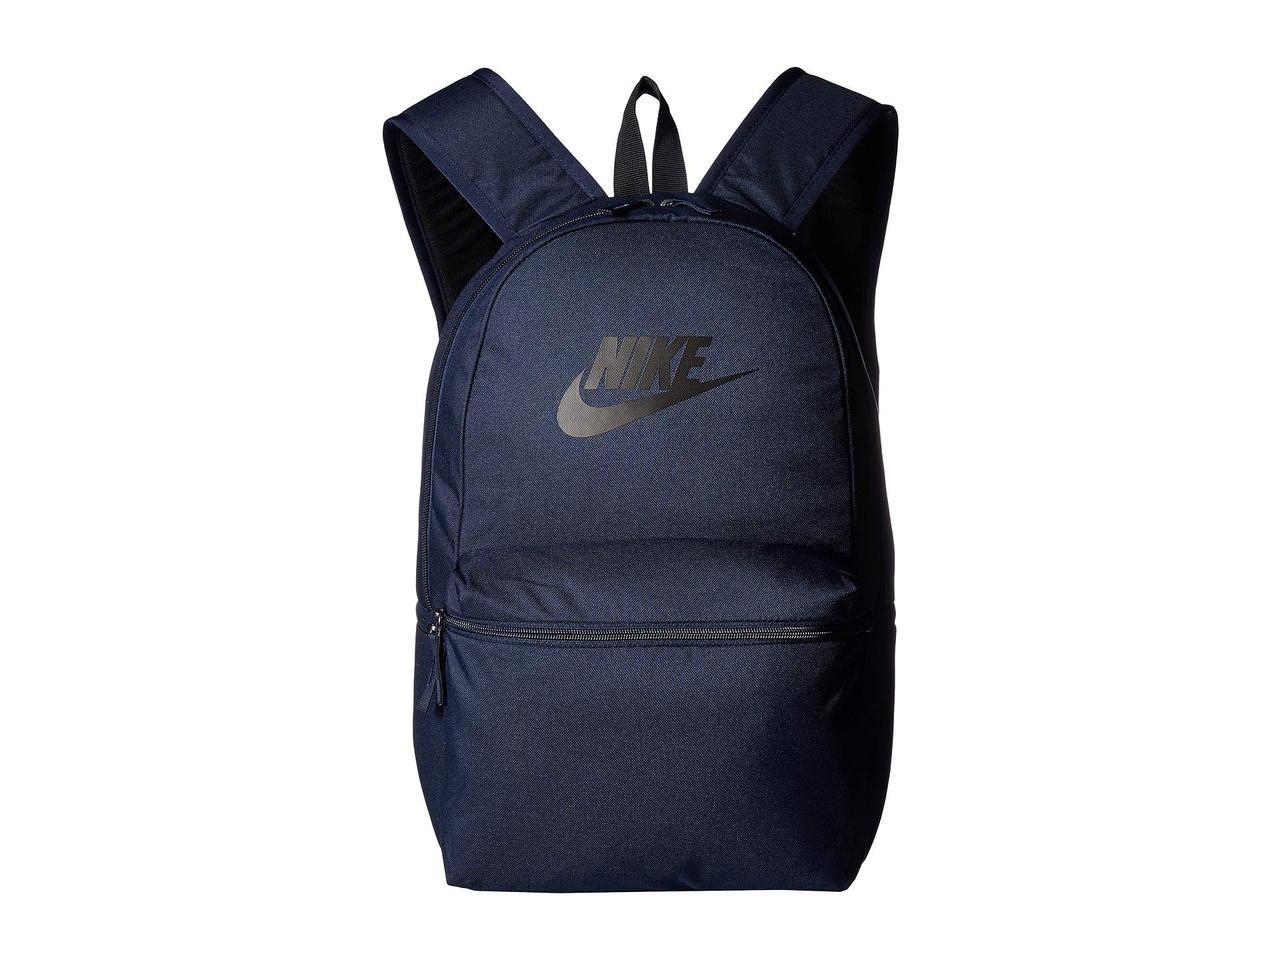 06971bca Рюкзак (Оригинал) Nike Heritage Backpack - Solid Obsidian/Black/Black -  TopUSA